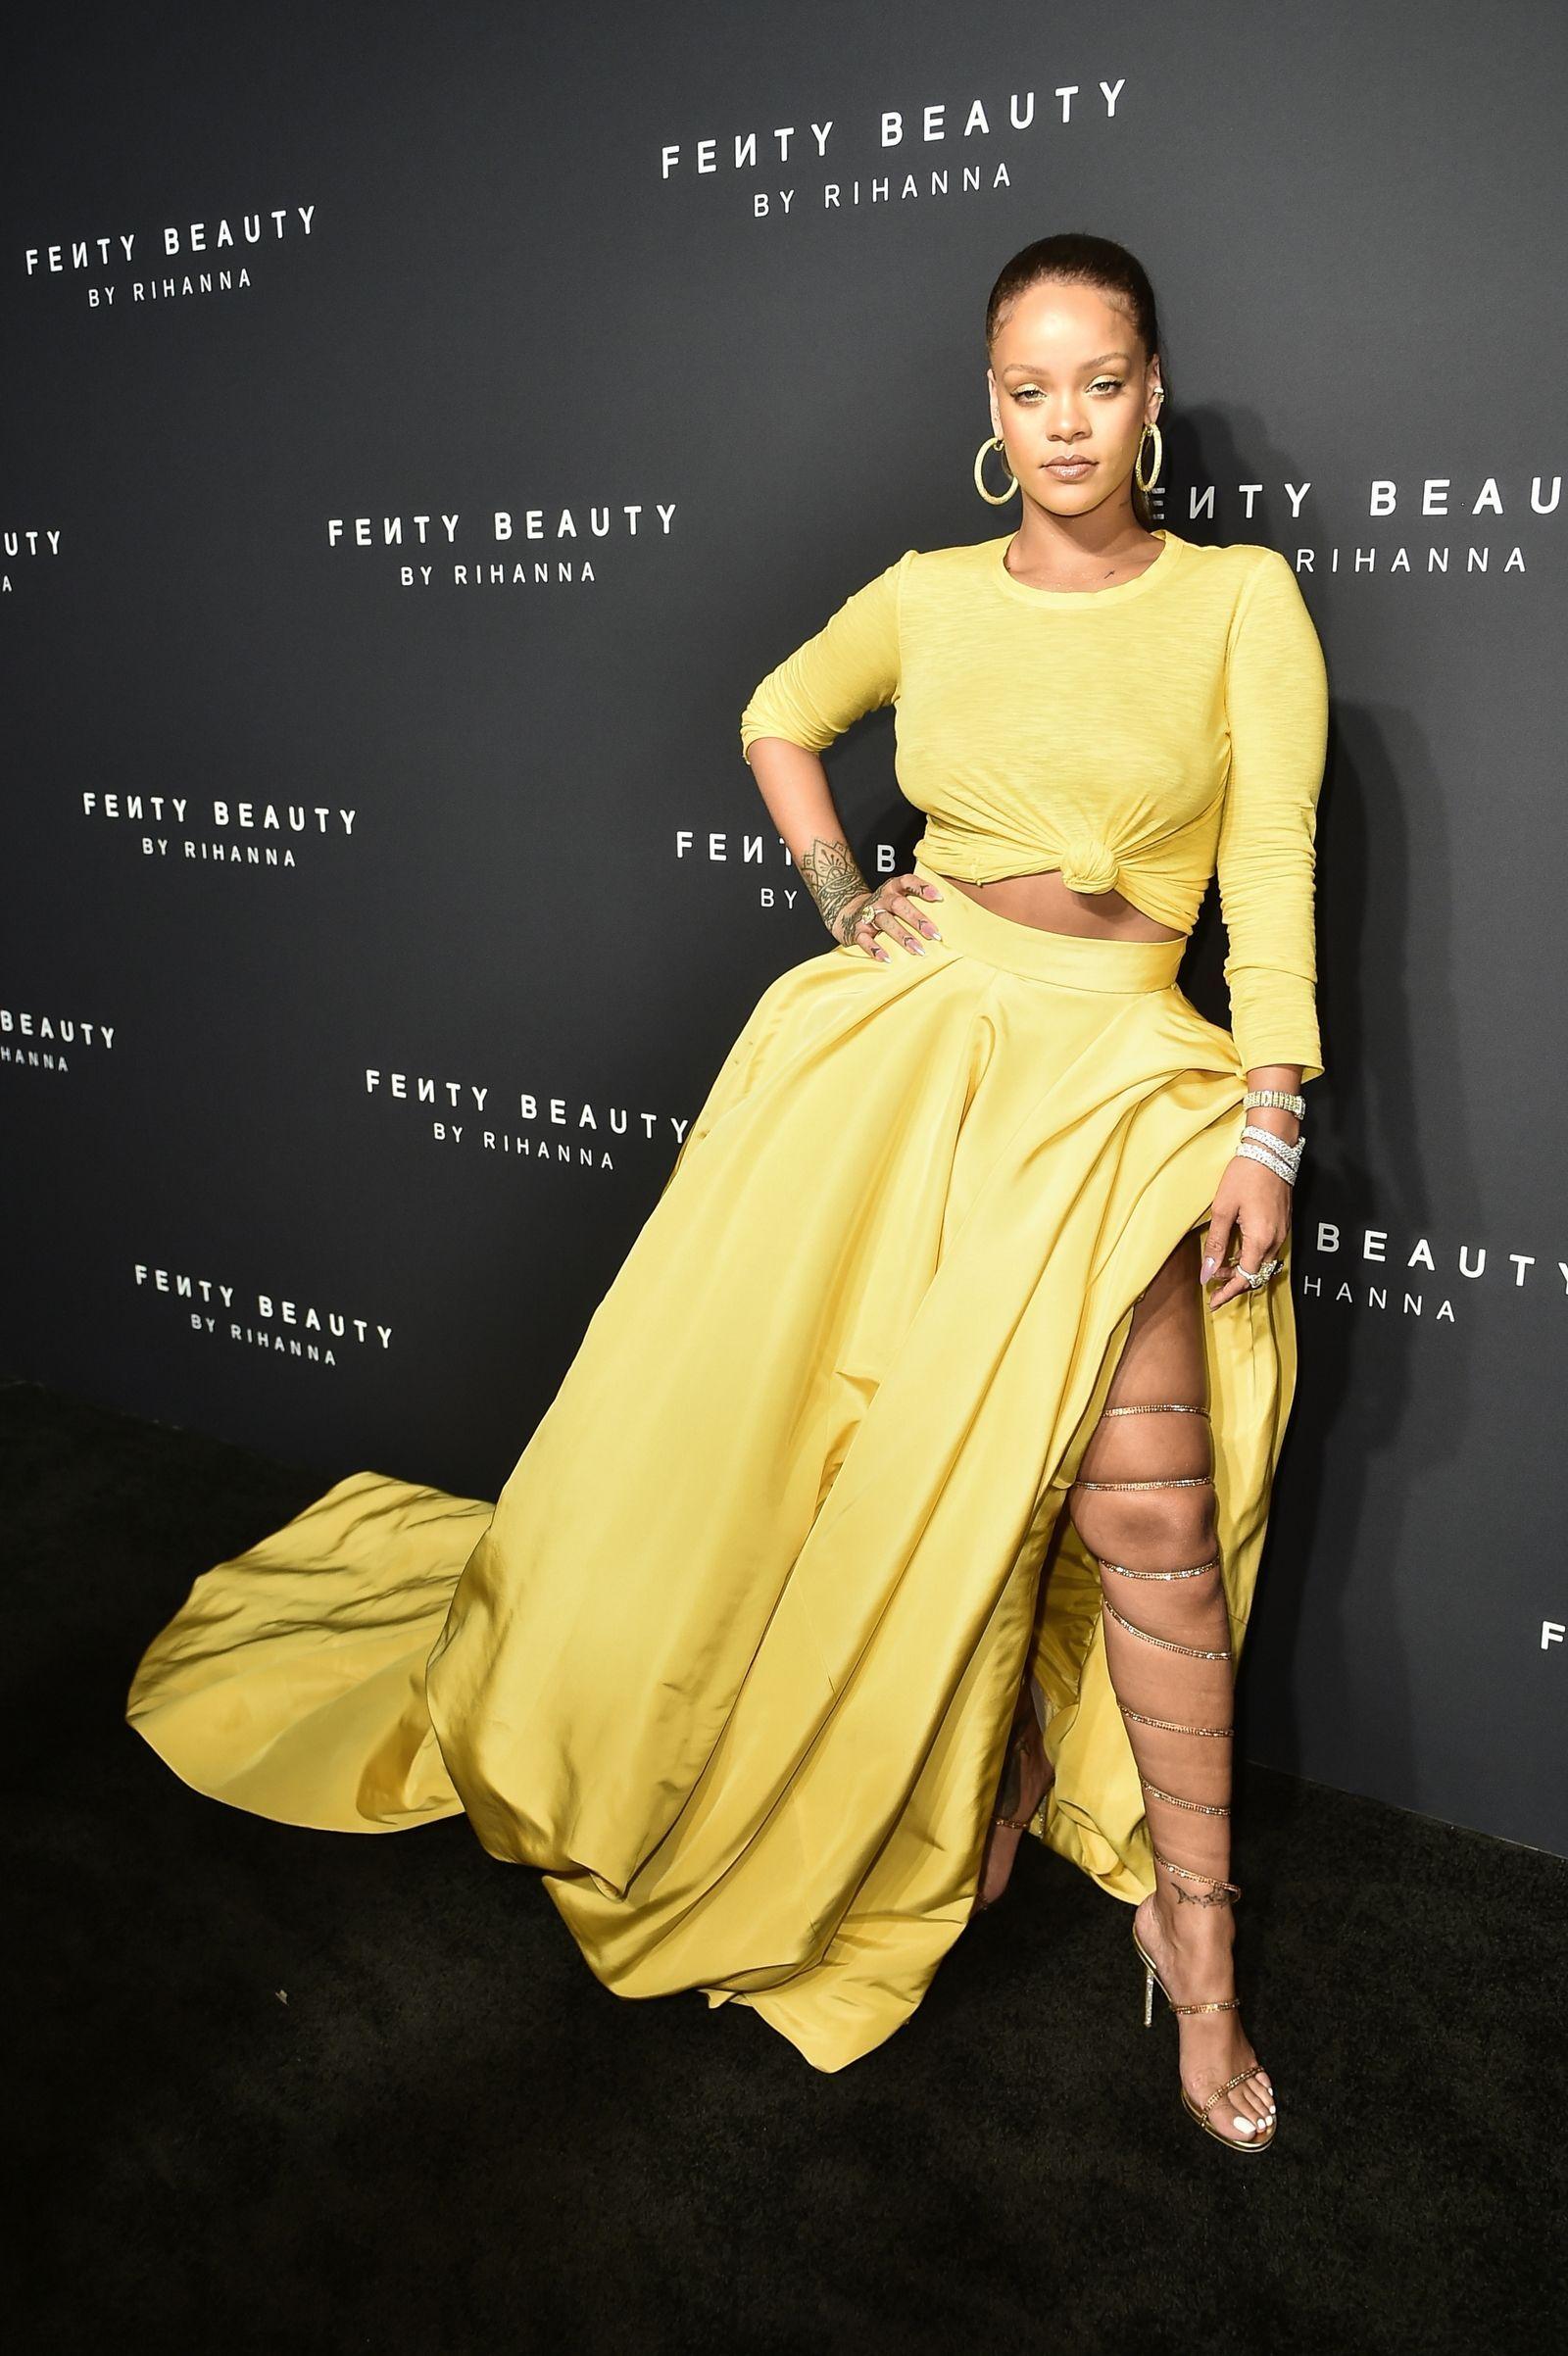 51455a35a8 Rihanna, in an Oscar de la Renta Crop Top and Giant, High-Slit Skirt at Her  Fenty Beauty Launch